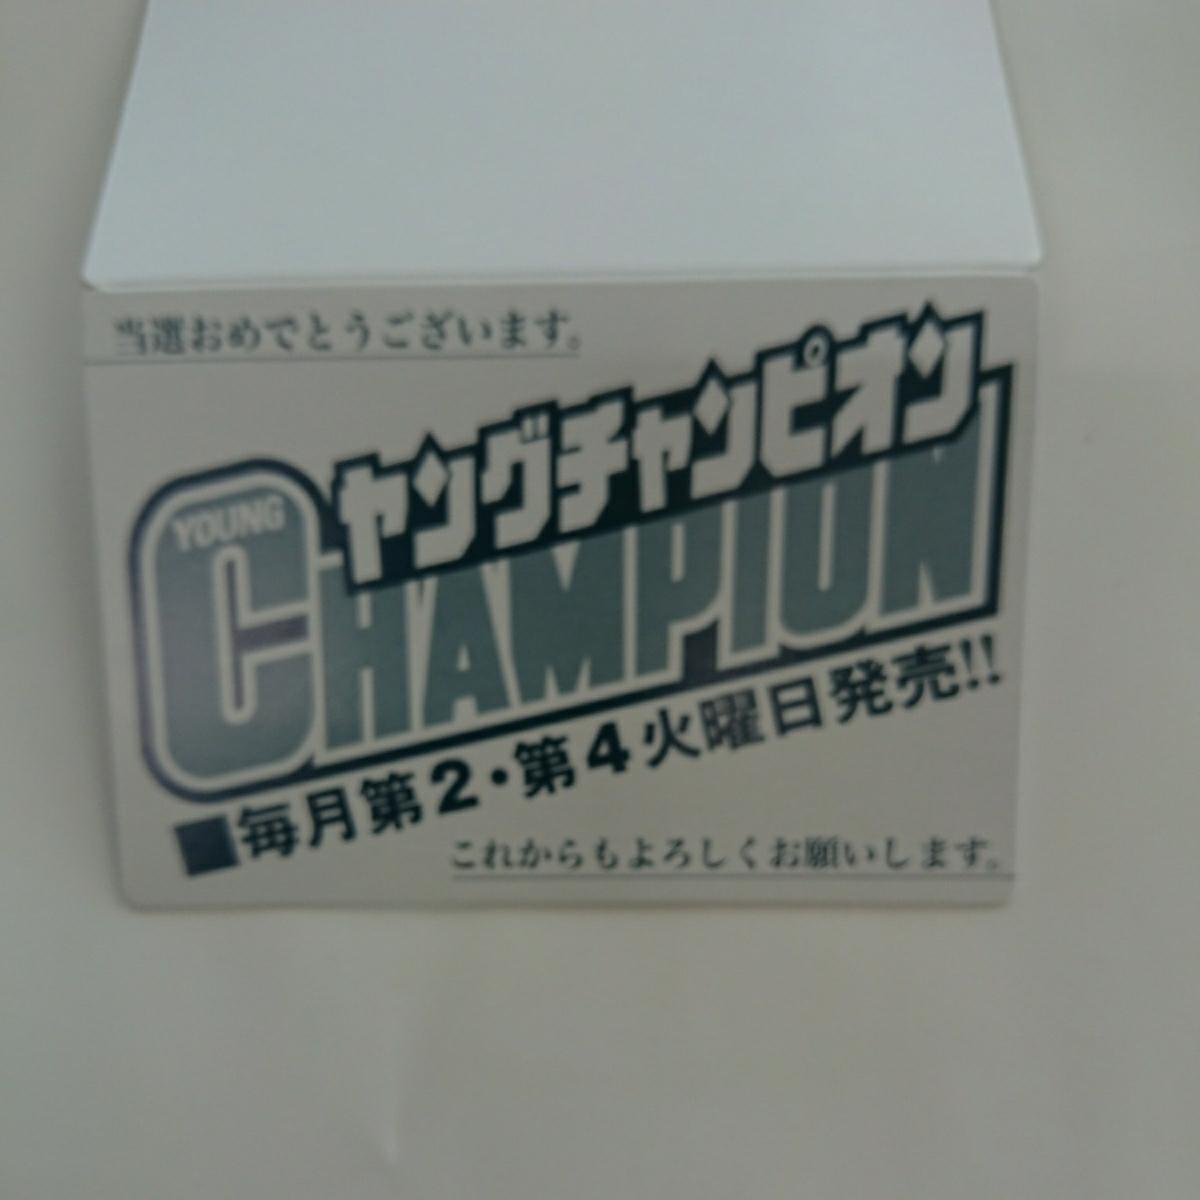 rare! Young Champion present selection![....]koka! free shipping! present selection notification paper